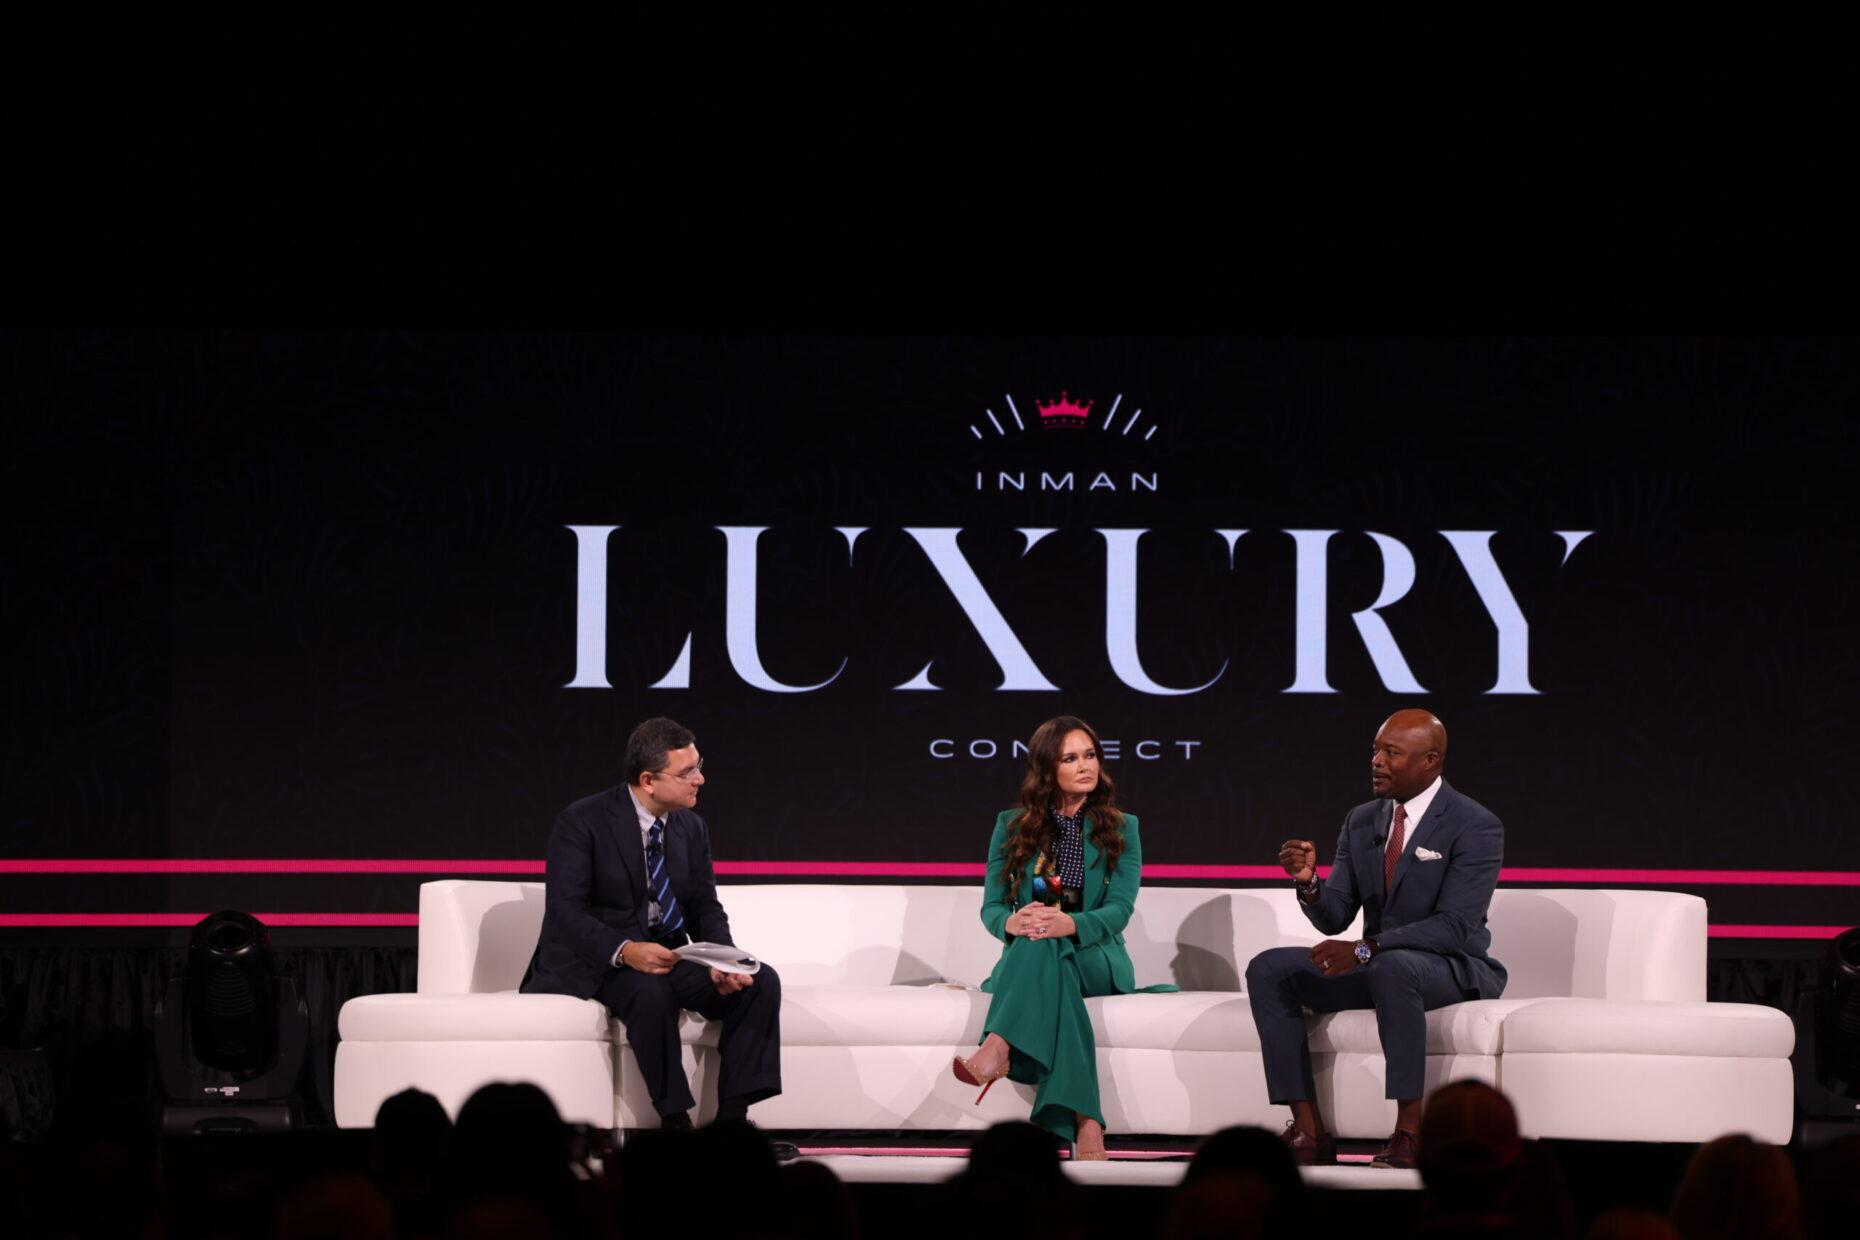 inman.com - Craig C. Rowe - Luxury leaders agree: digital marketing rests on authenticity